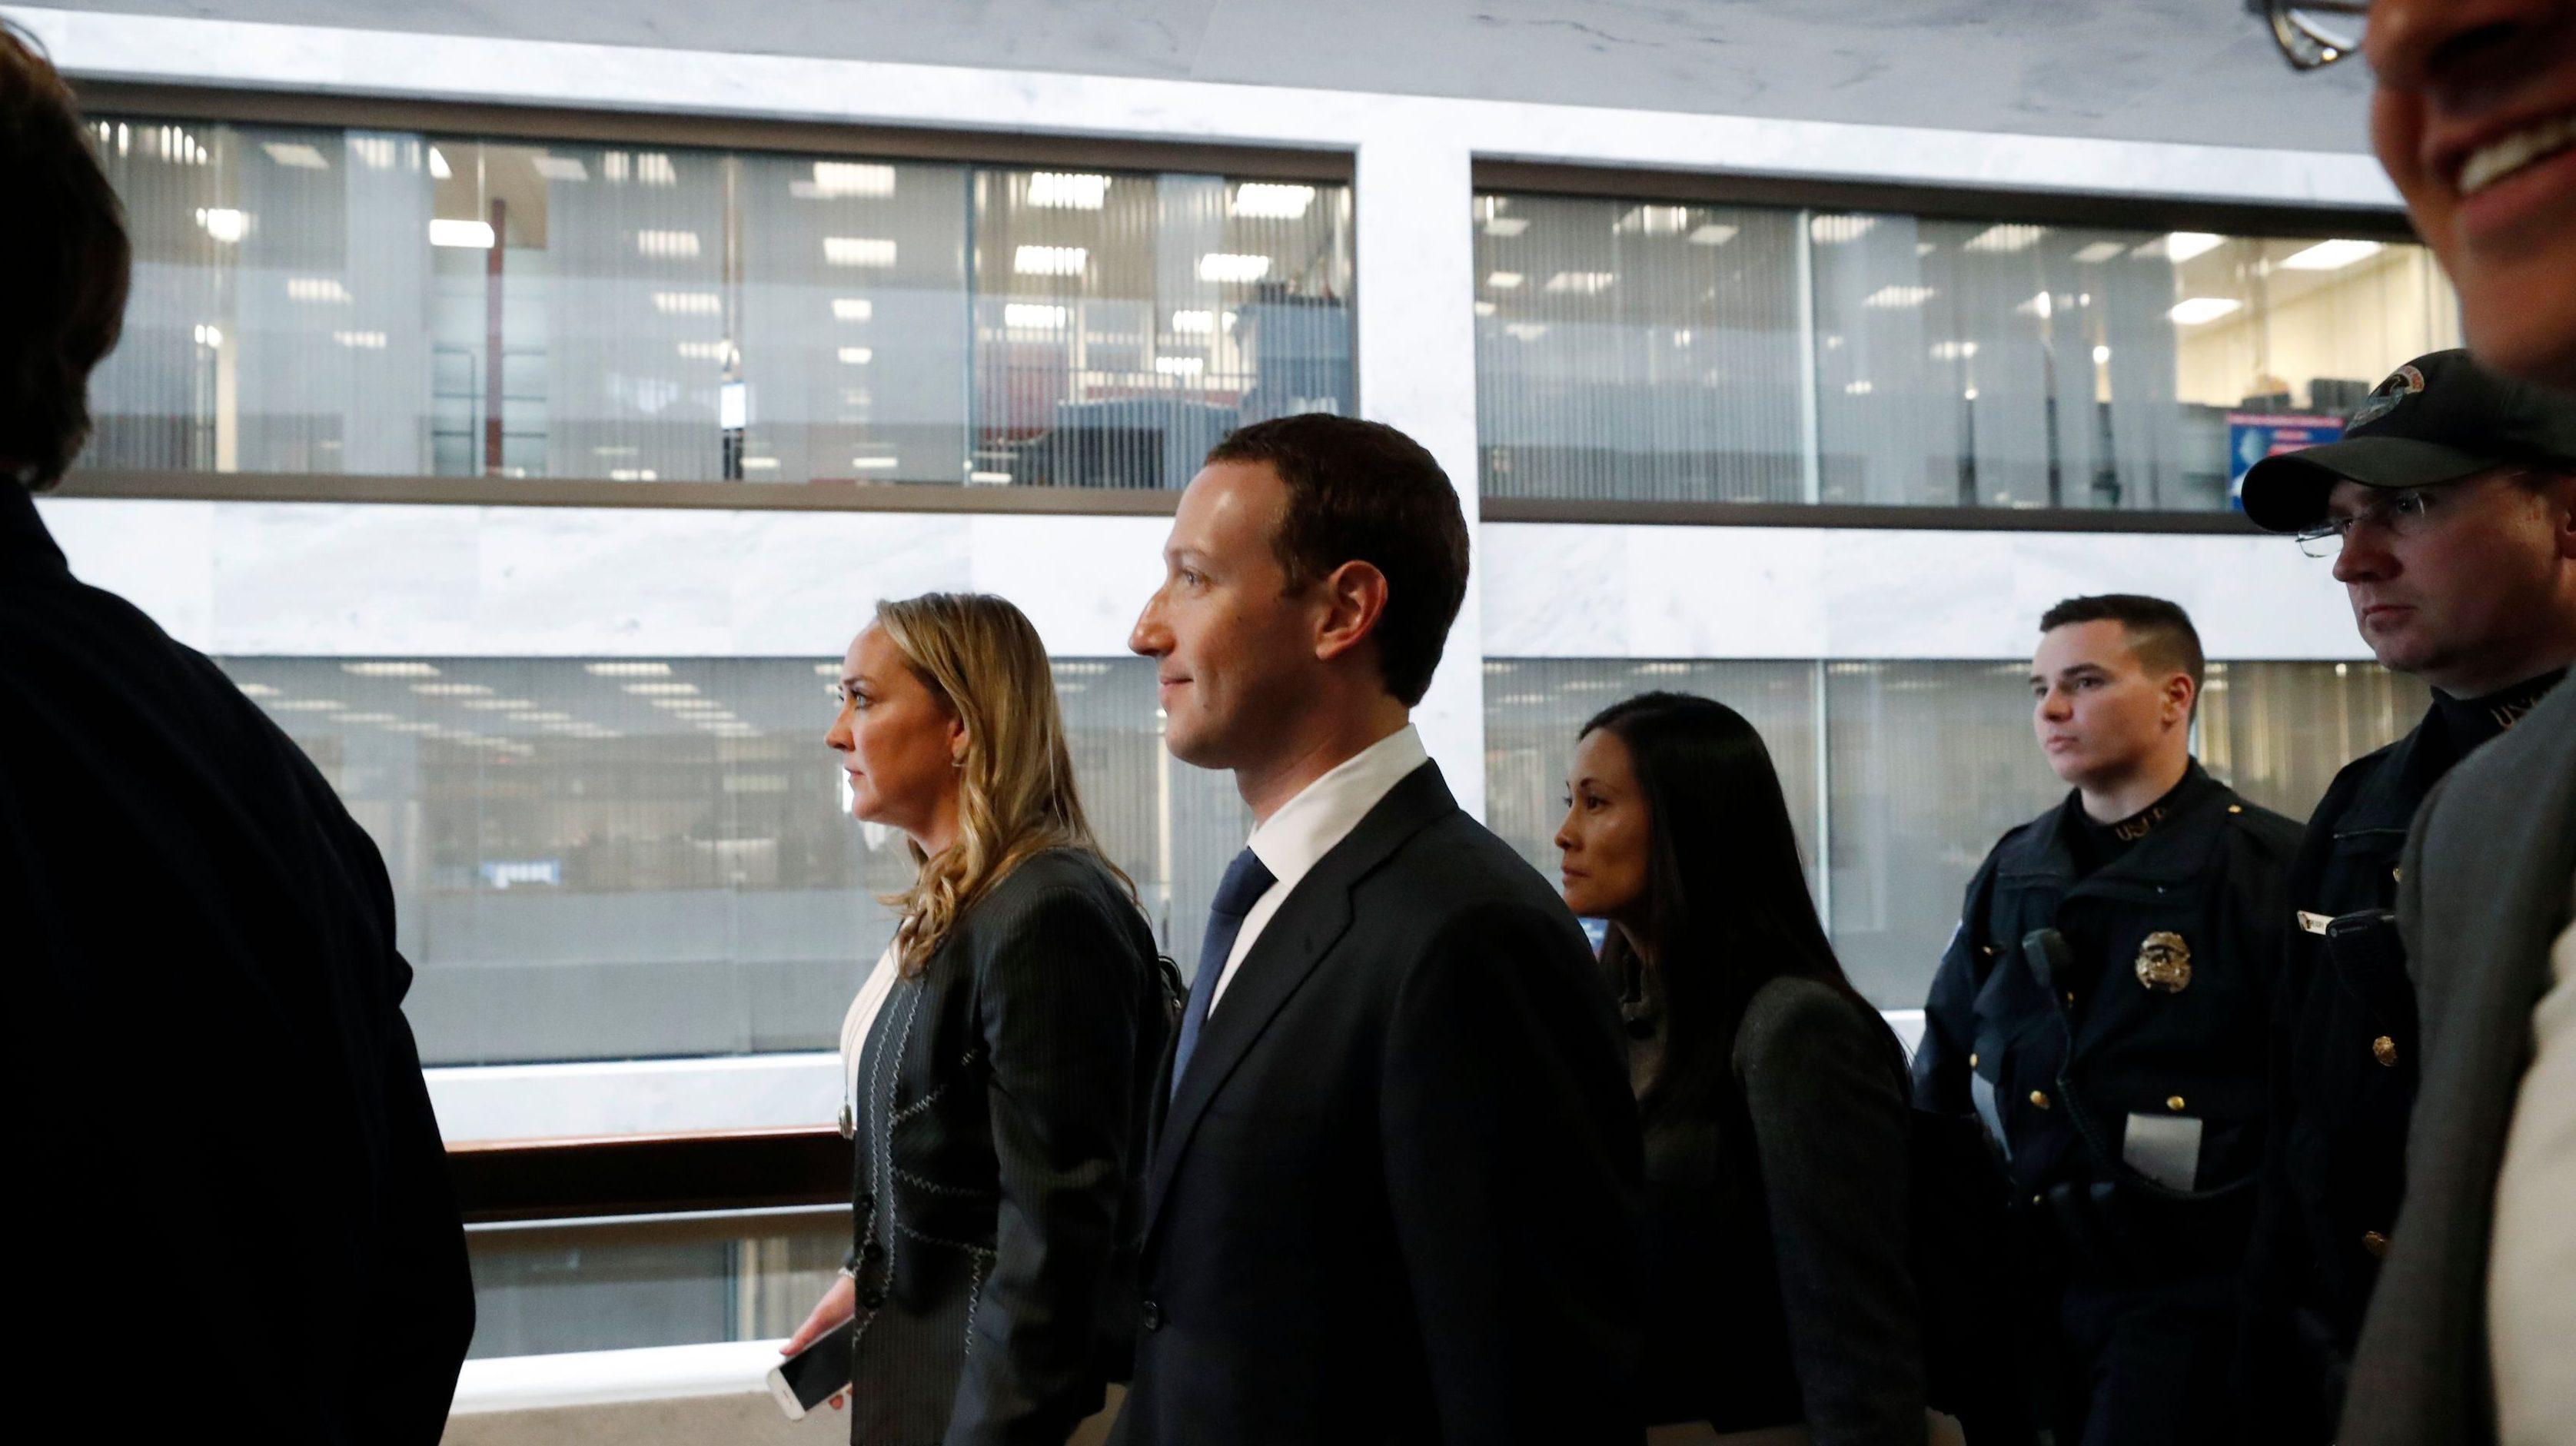 Facebook CEO Mark Zuckerberg walks to a meeting with Senator John Thune (R-SD) on Capitol Hill in Washington, U.S., April 9, 2018. REUTERS/Leah Millis - HP1EE491L124M